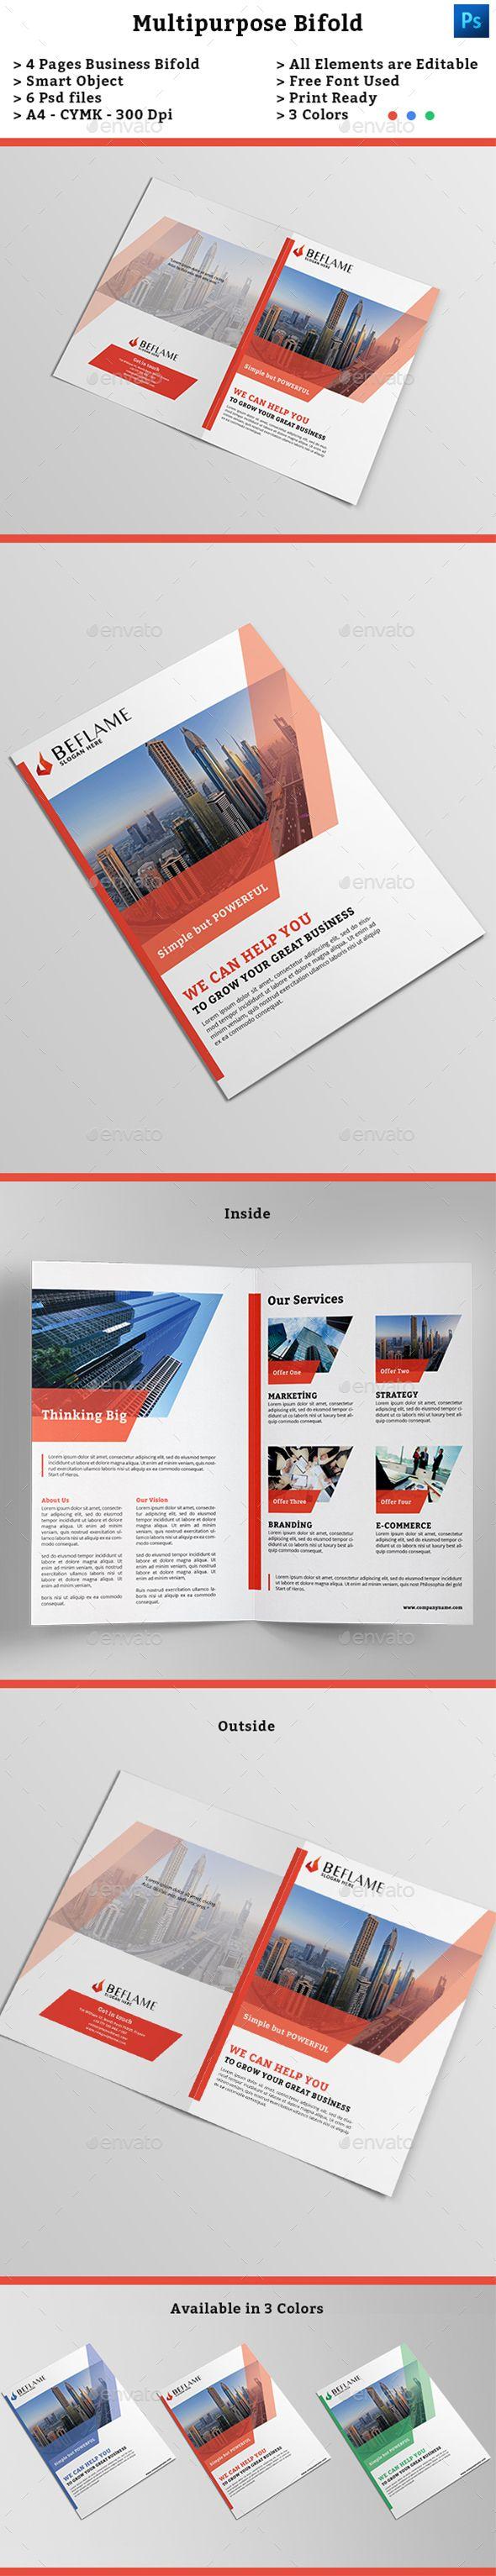 Corporate Bifold Brochure Template PSD #design Download: http://graphicriver.net/item/corporate-bifold-brochure-template/13748766?ref=ksioks